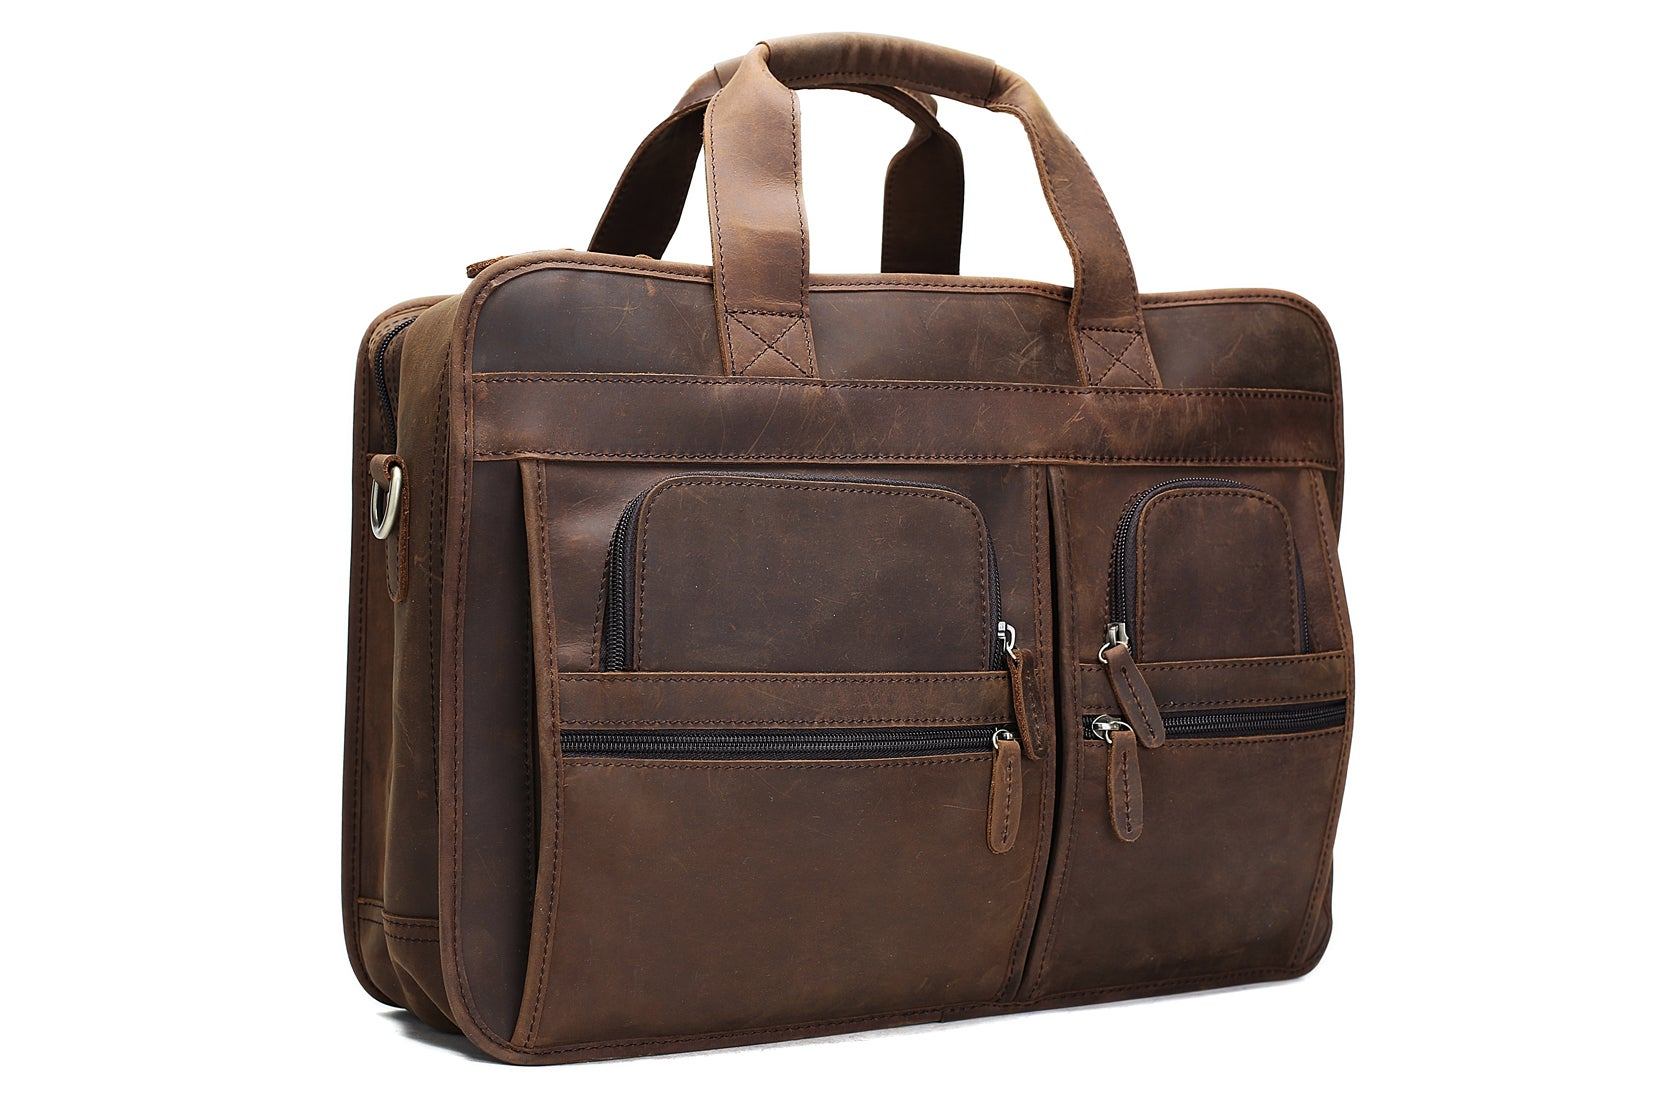 5a88ccff9e84 Handmade Genuine Leather Luggage Bag Travel Bag Laptop Briefcase DZ11